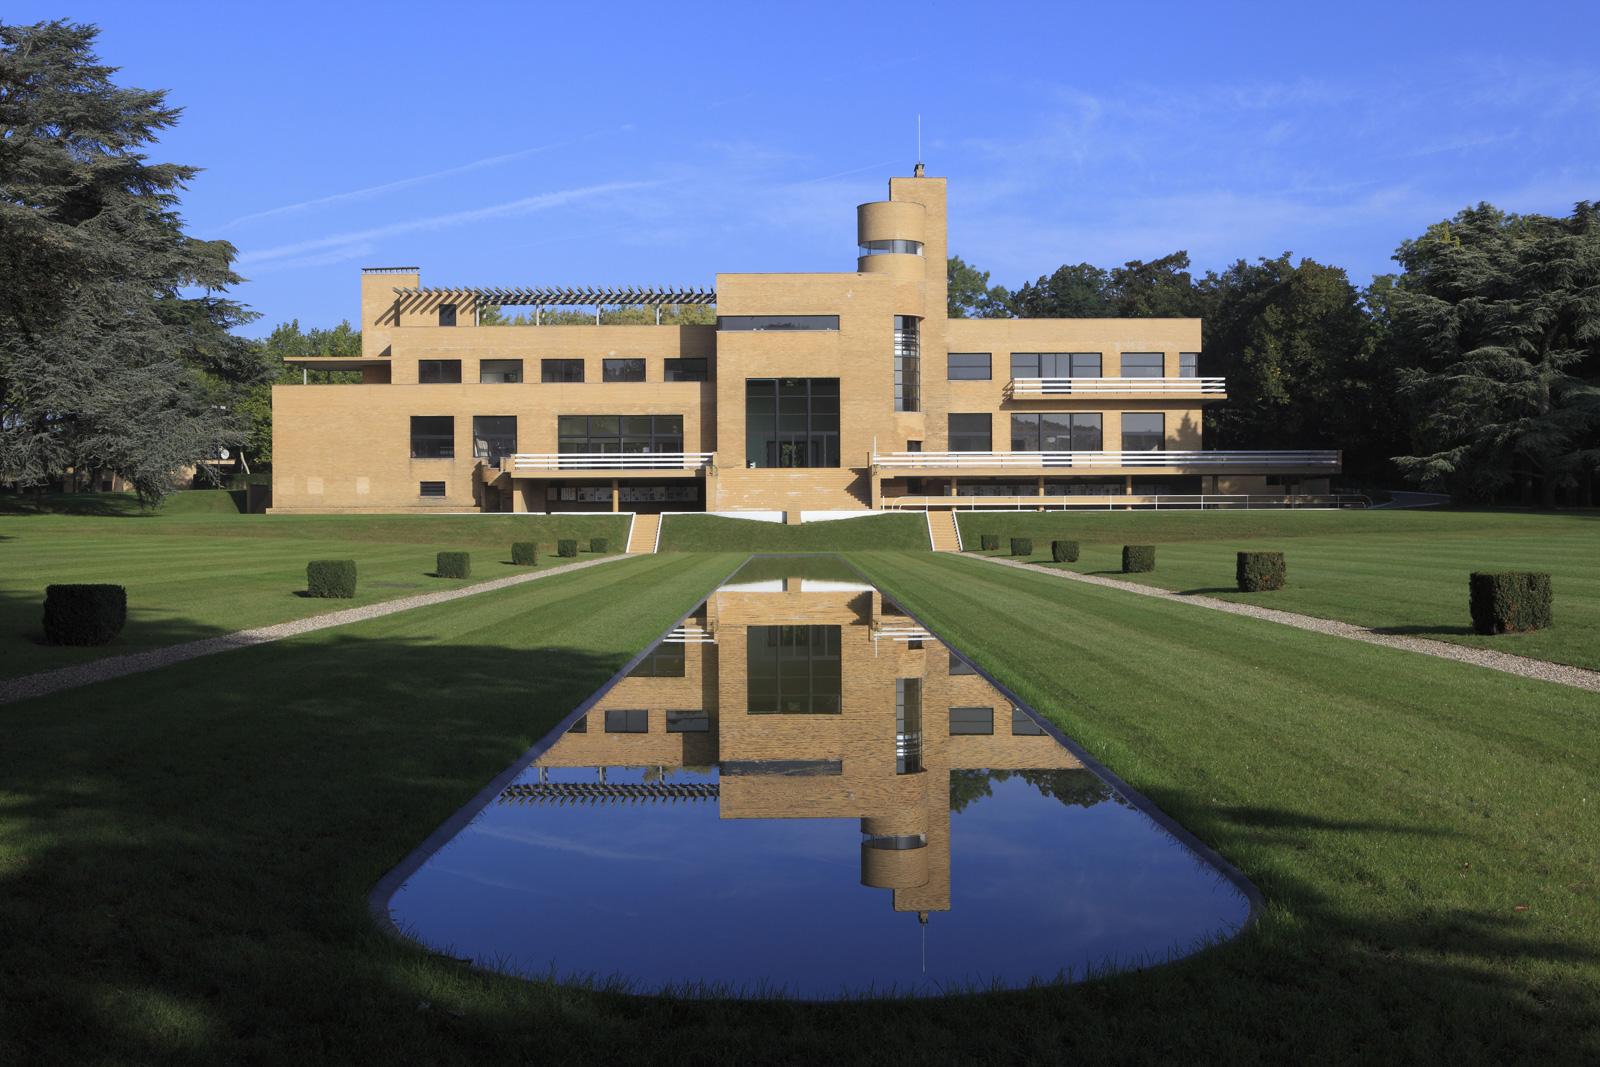 Villa Cavrois' south facade. Photography: Jean-Luc Paillé / Centre National Monuments